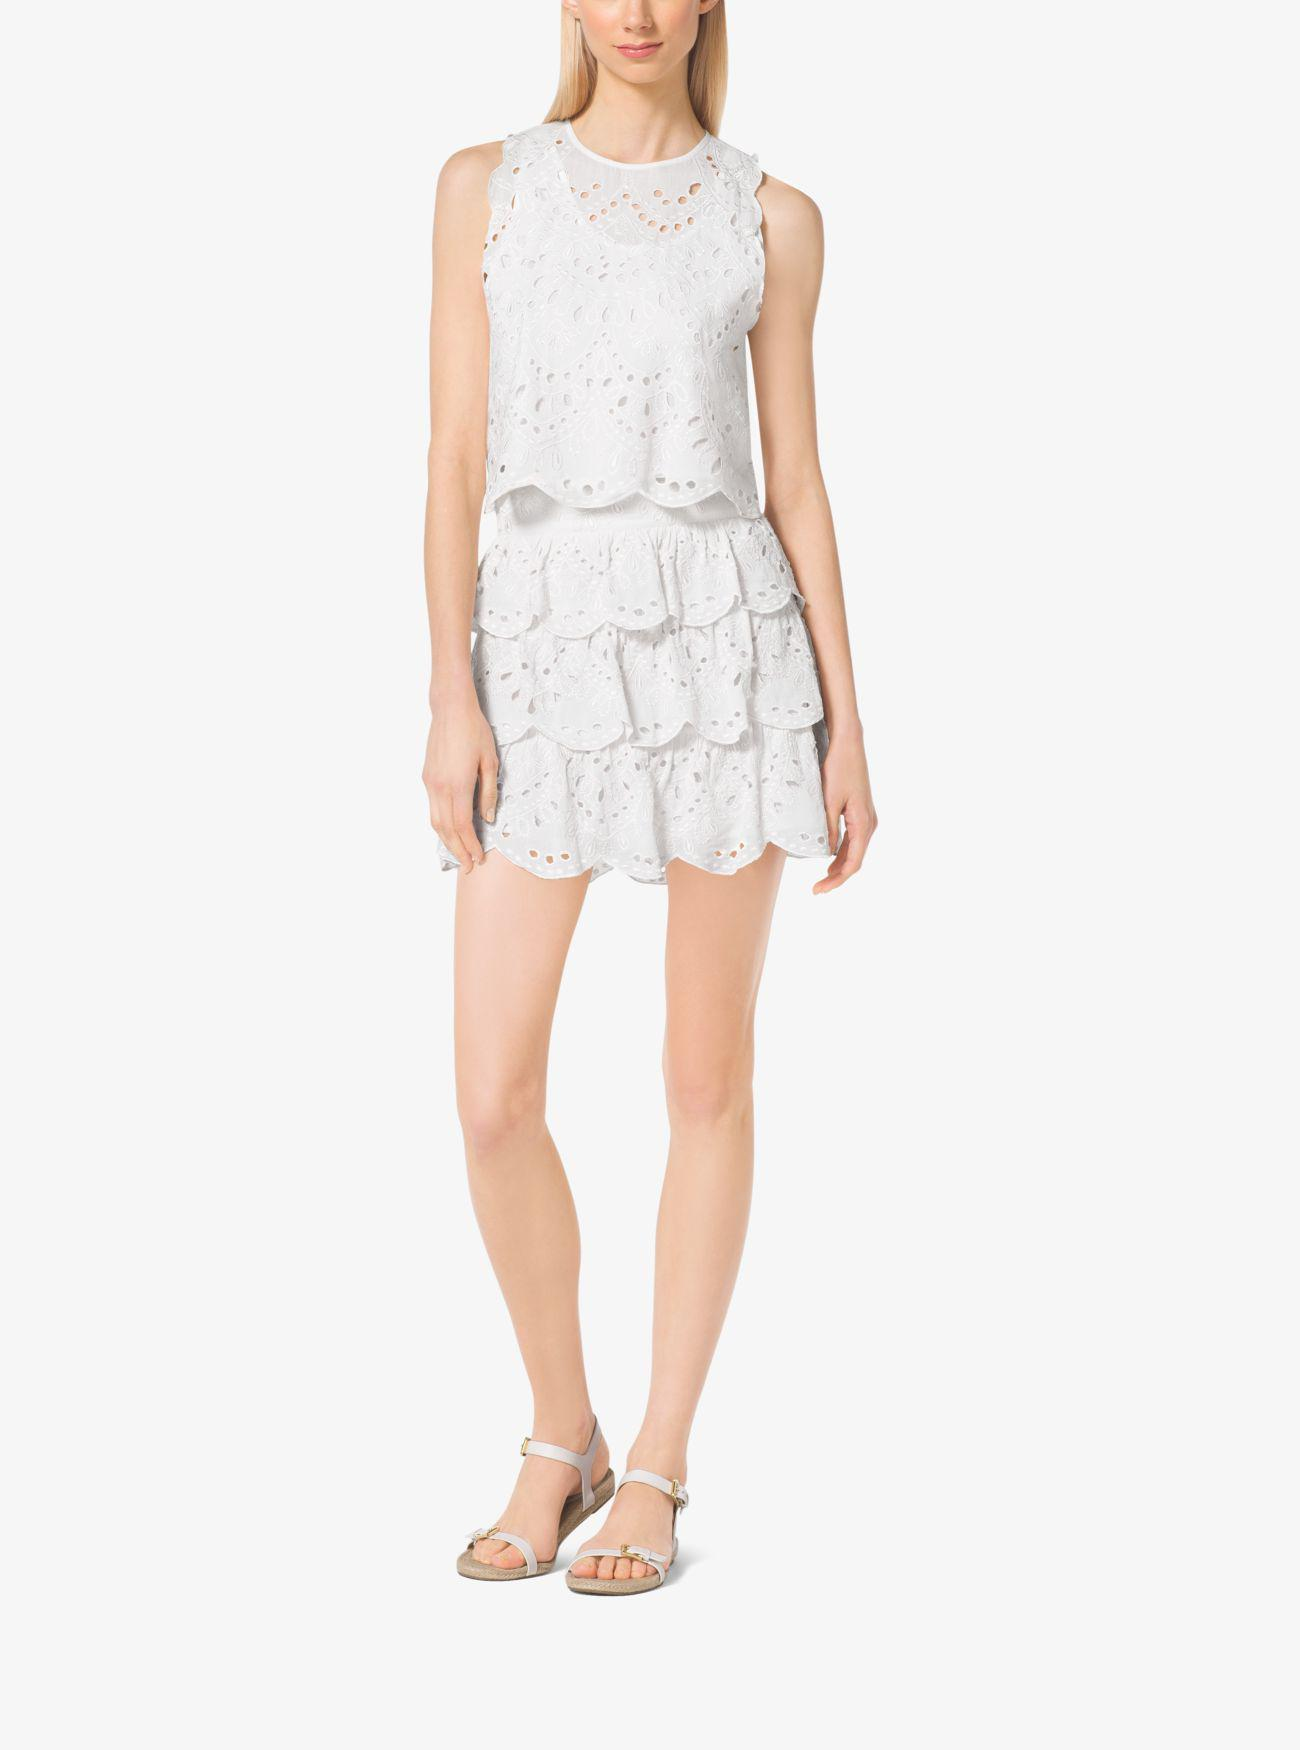 d344ed6eb57d Michael Kors Scalloped Eyelet-embroidered Cotton Skirt in White - Lyst